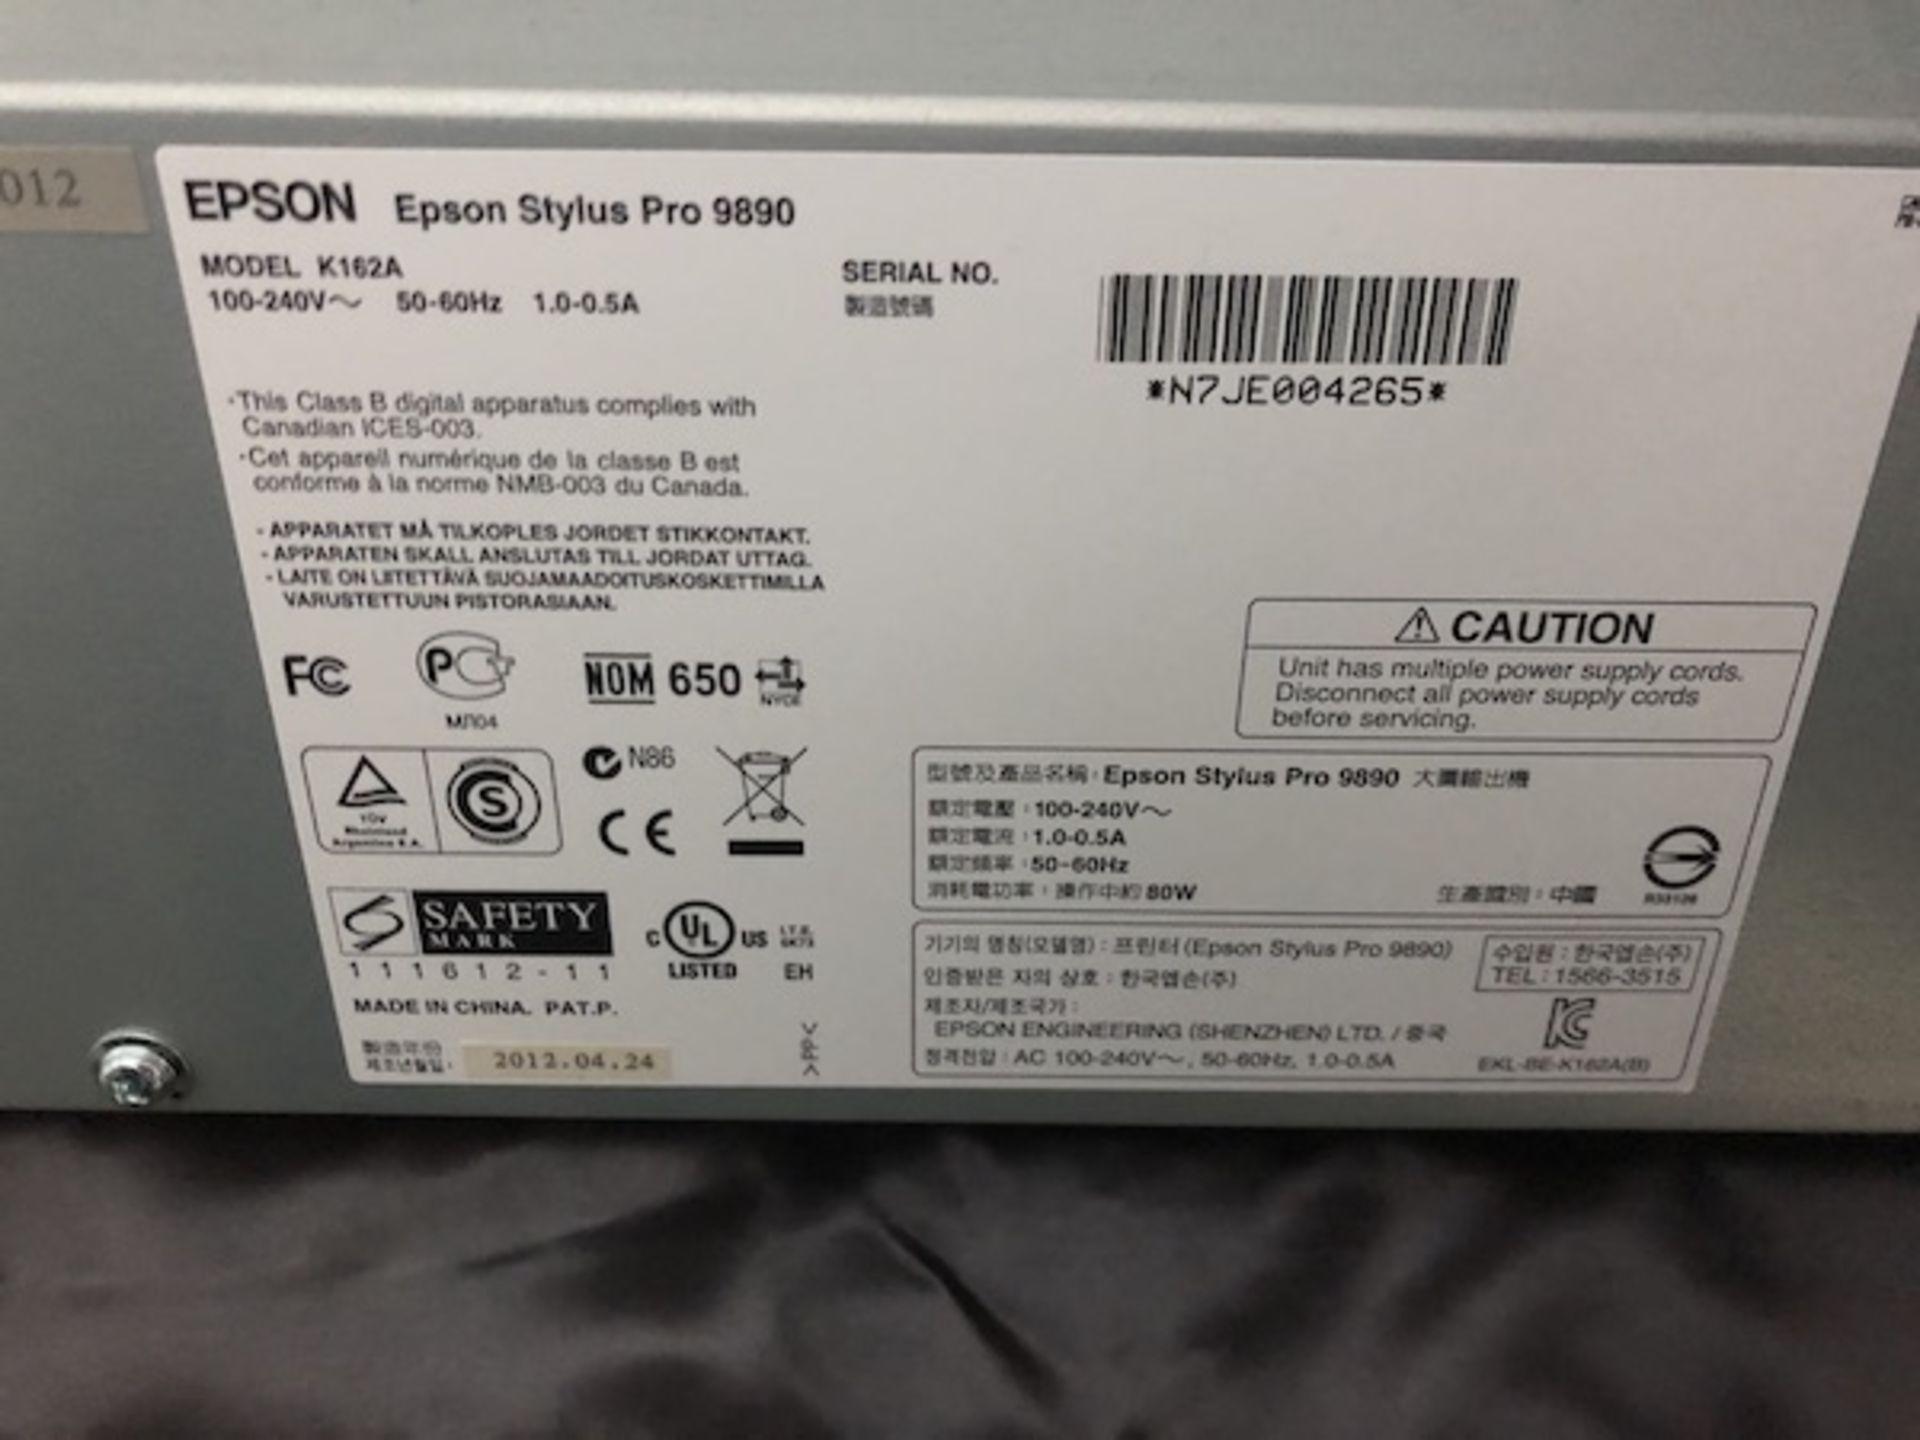 Lot 204 - Epson Model Stylus Pro 9890 Proofer, 44Ó, With In-Line Spectroproofer